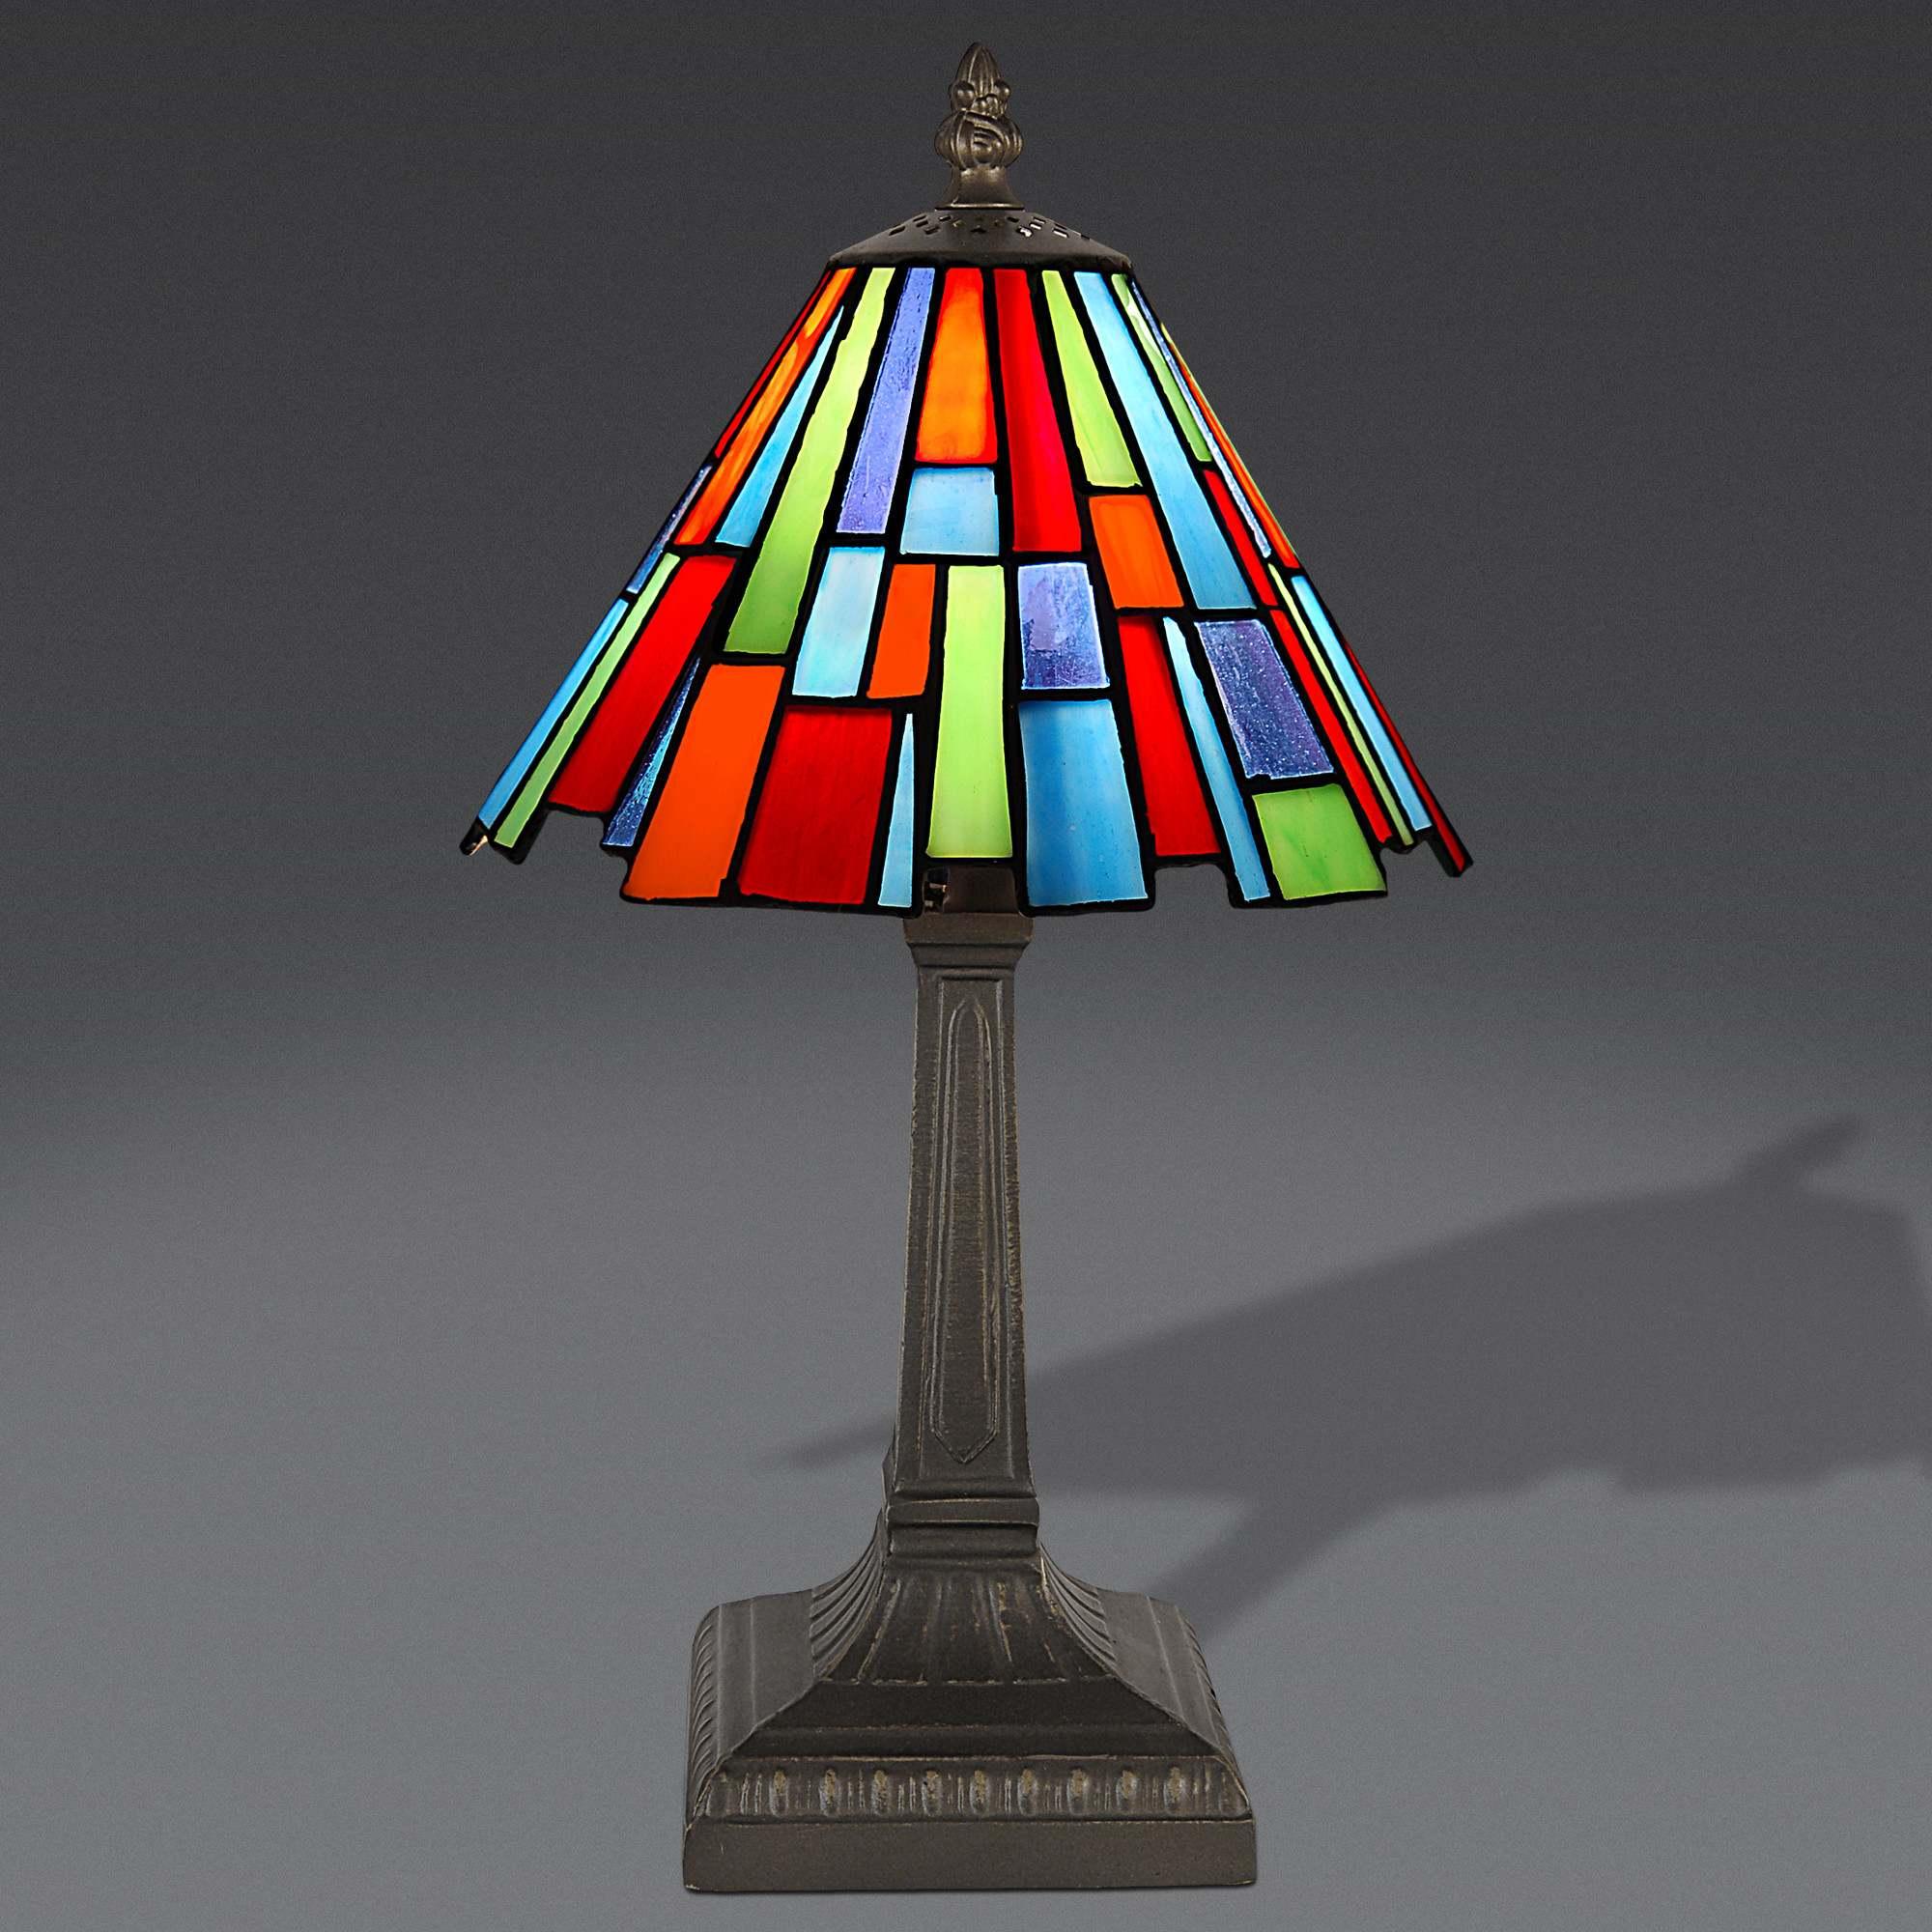 lampada stile tiffany abat jour arlecchino lampada stile tiffany in vendita. Black Bedroom Furniture Sets. Home Design Ideas